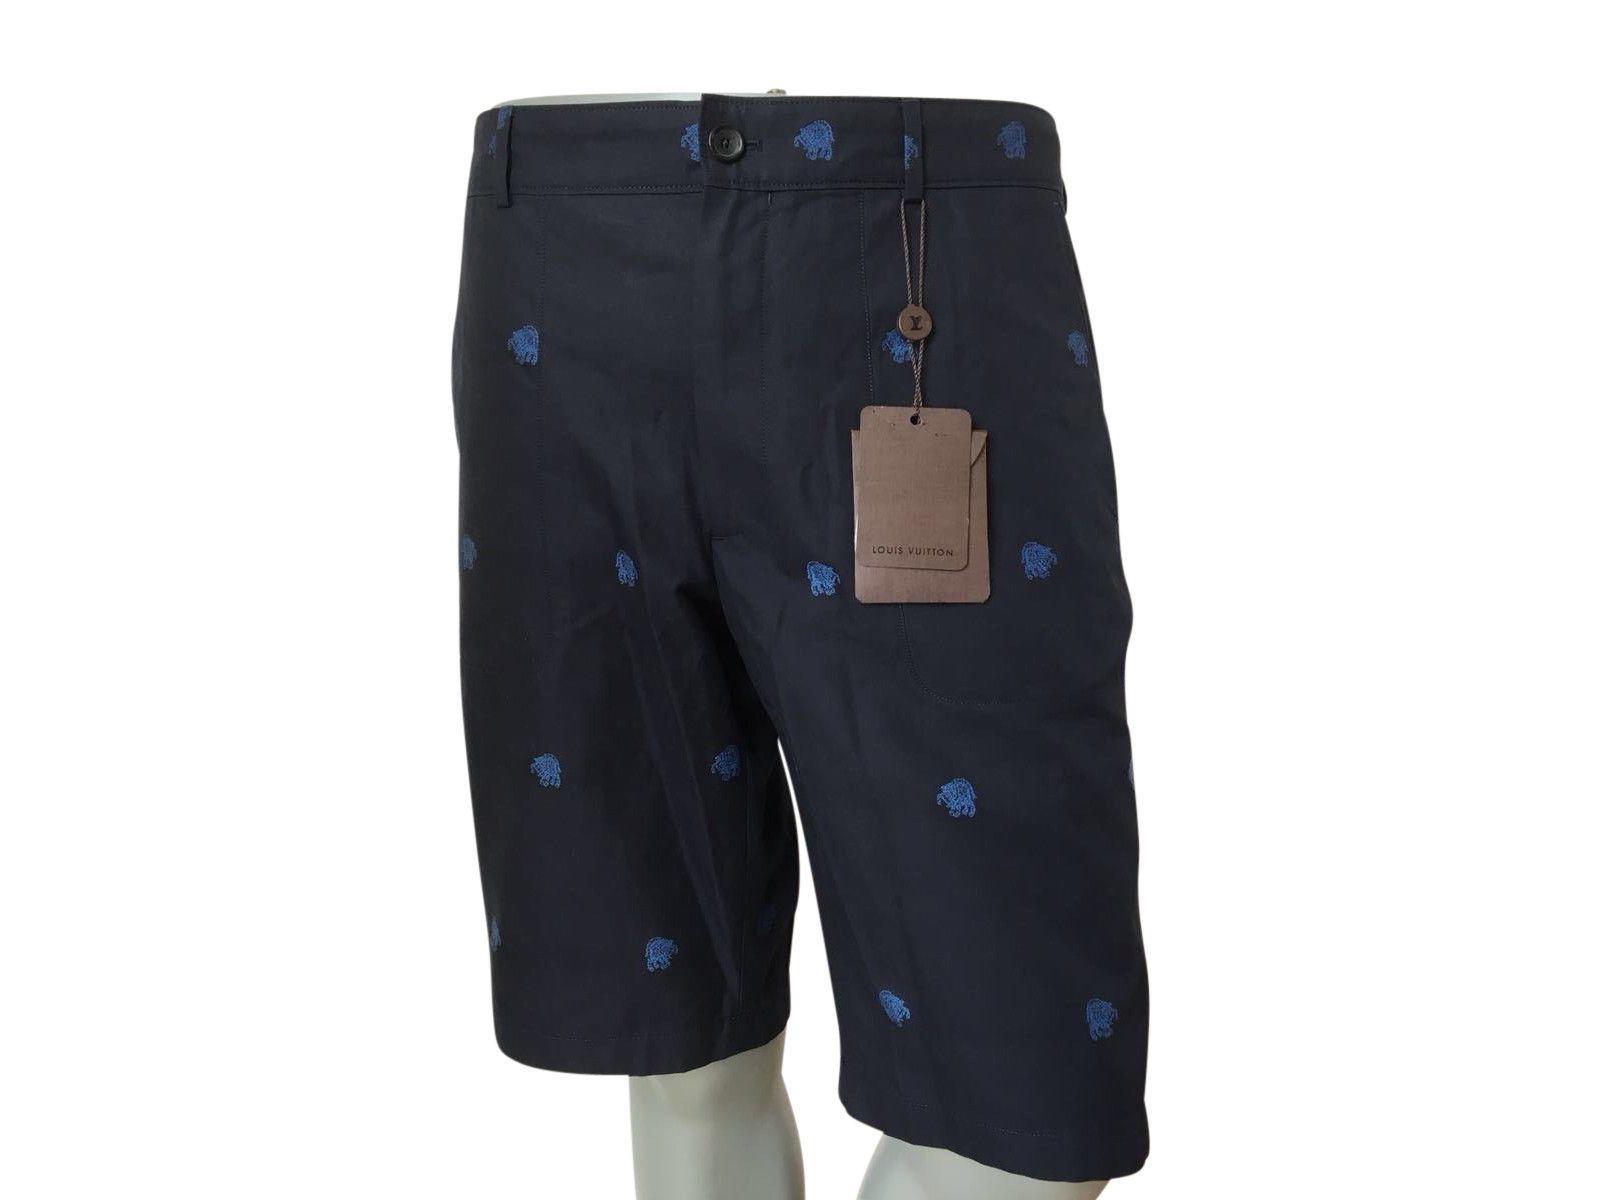 077bc27090ea Louis Vuitton Chapman Chino Shorts